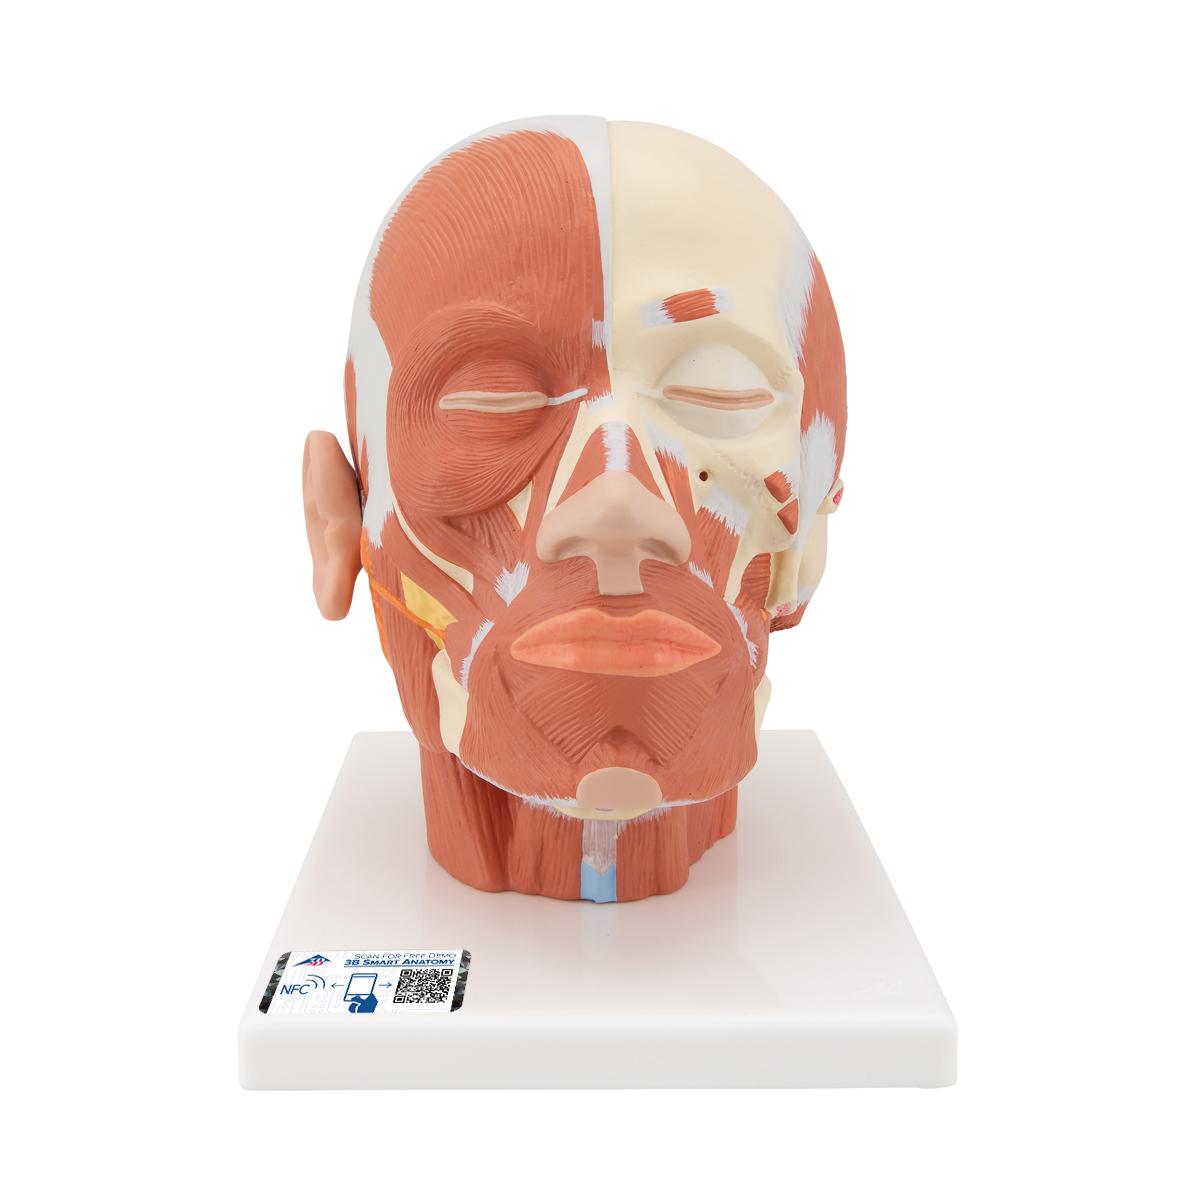 Anatomical Teaching Models Plastic Anatomy Models Head Musculature